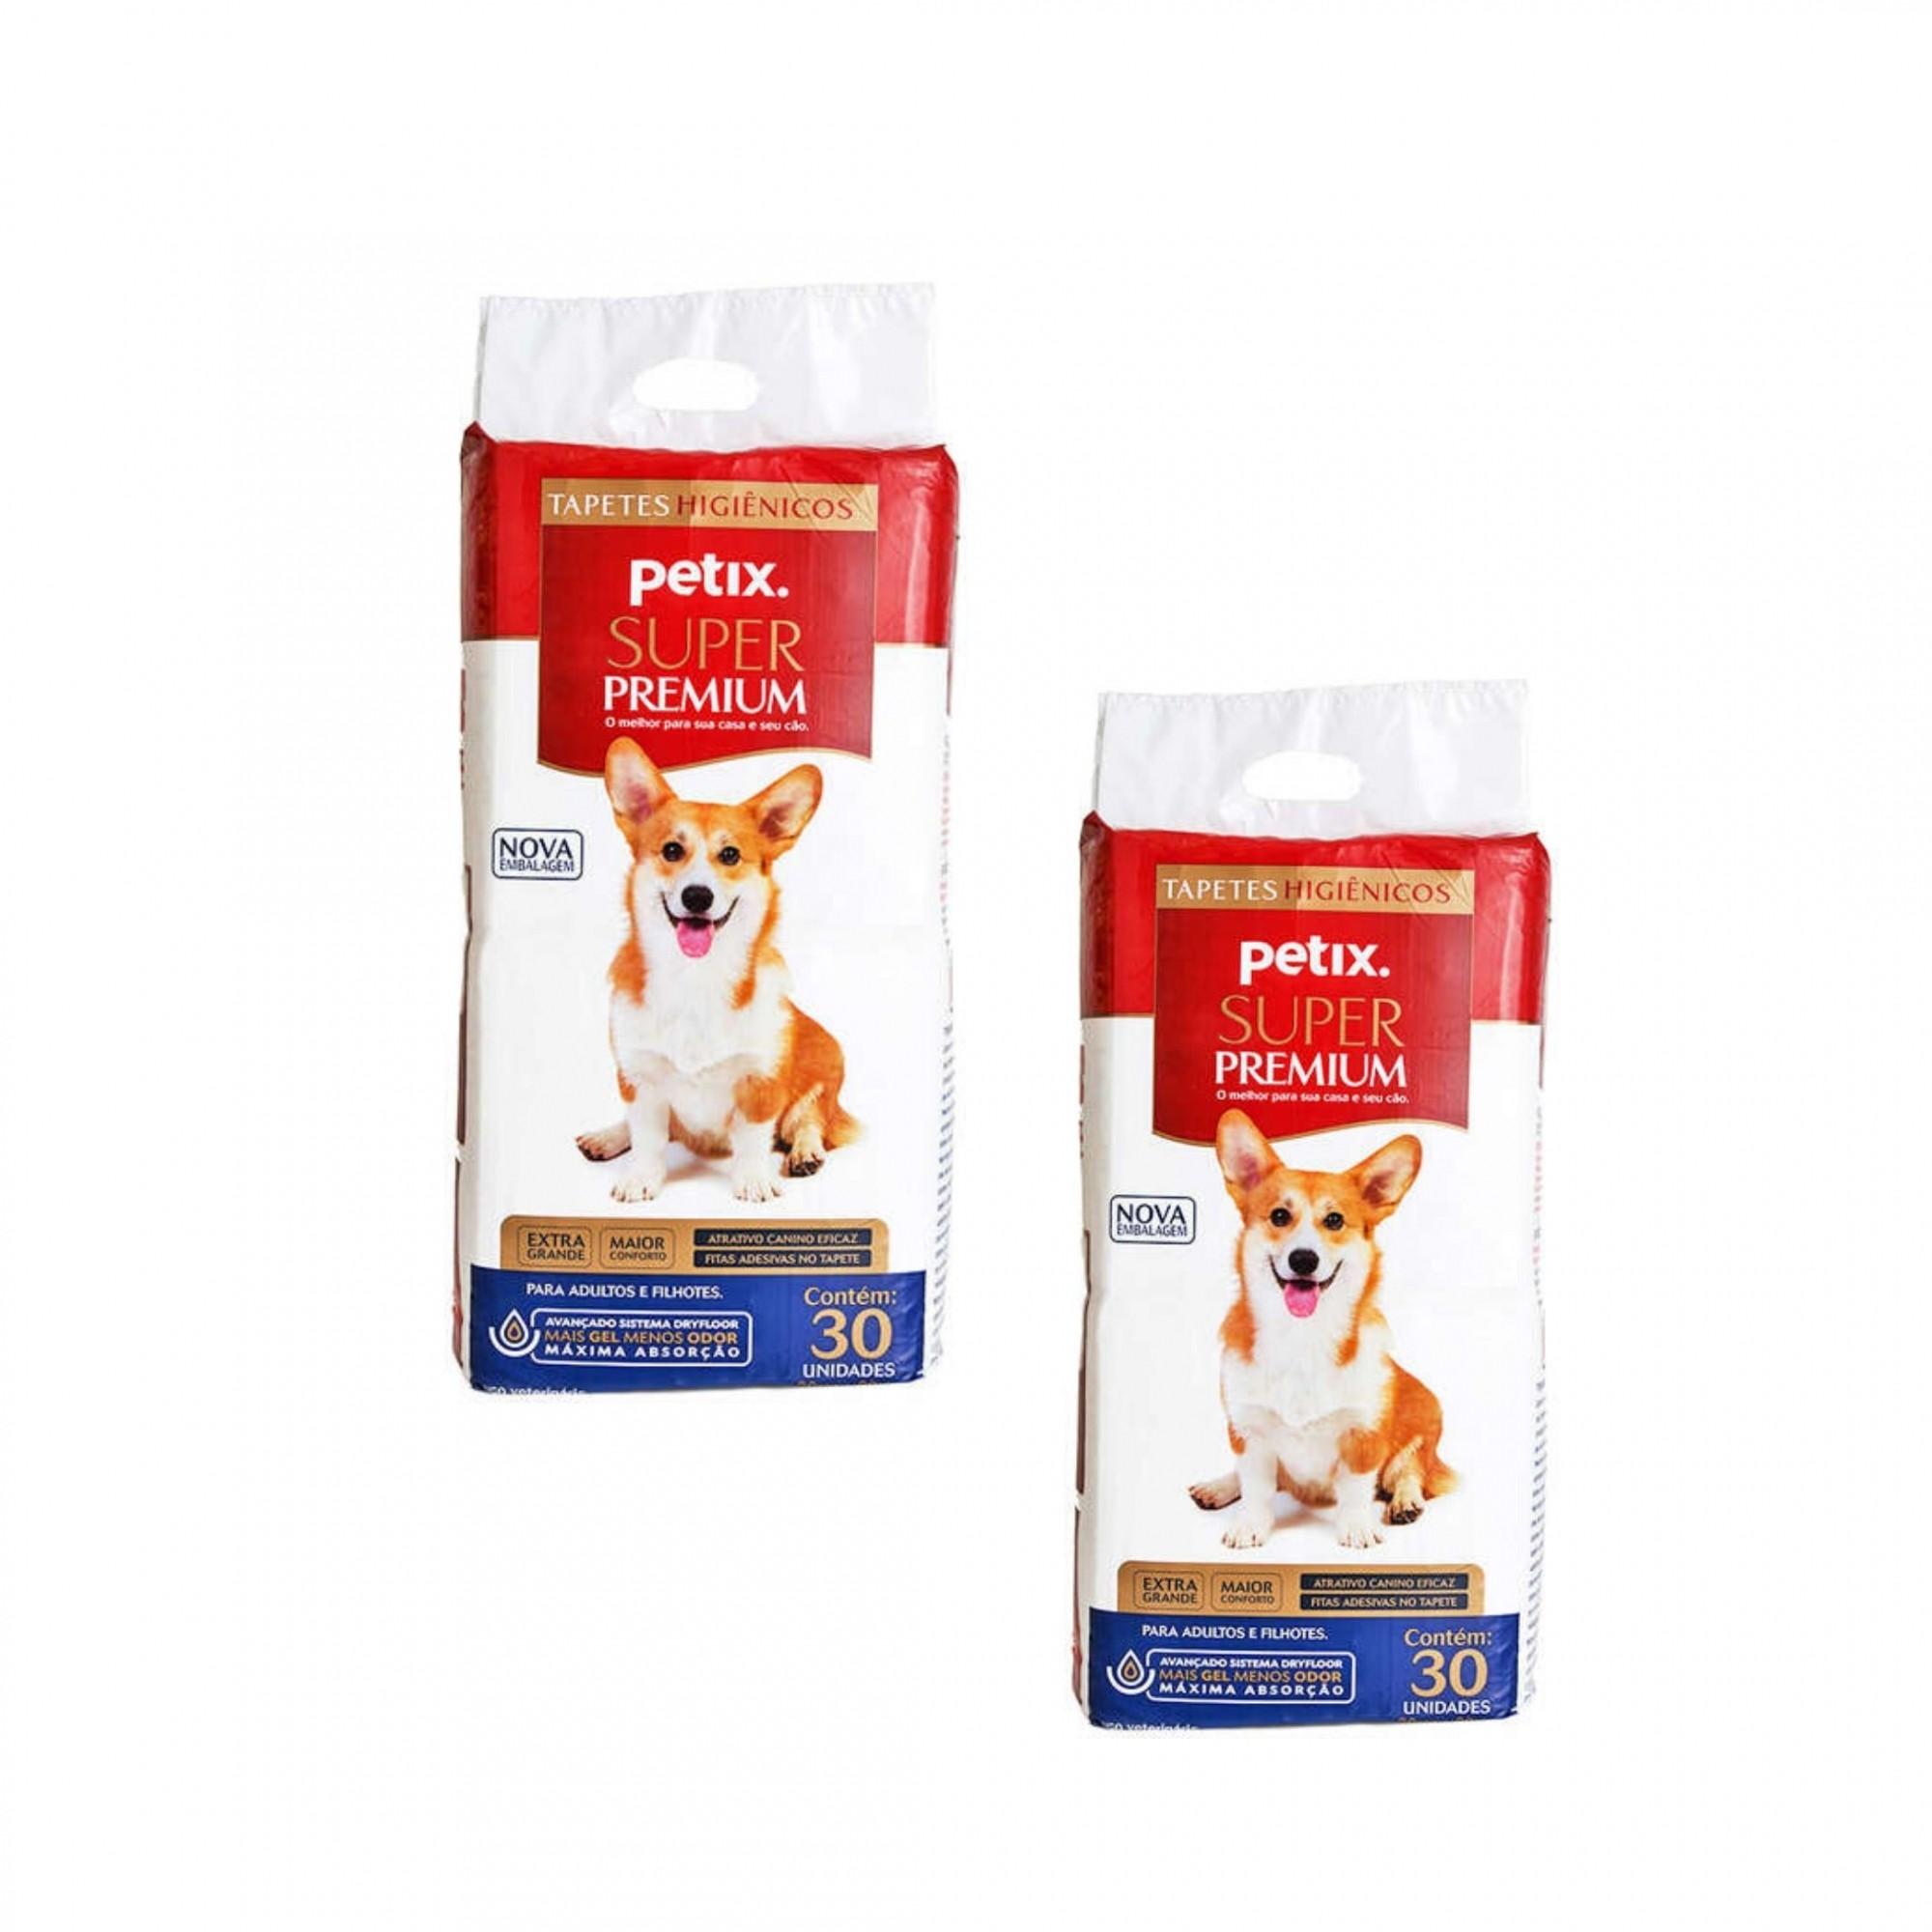 Kit Tapete Higiênico Petix Super Premium